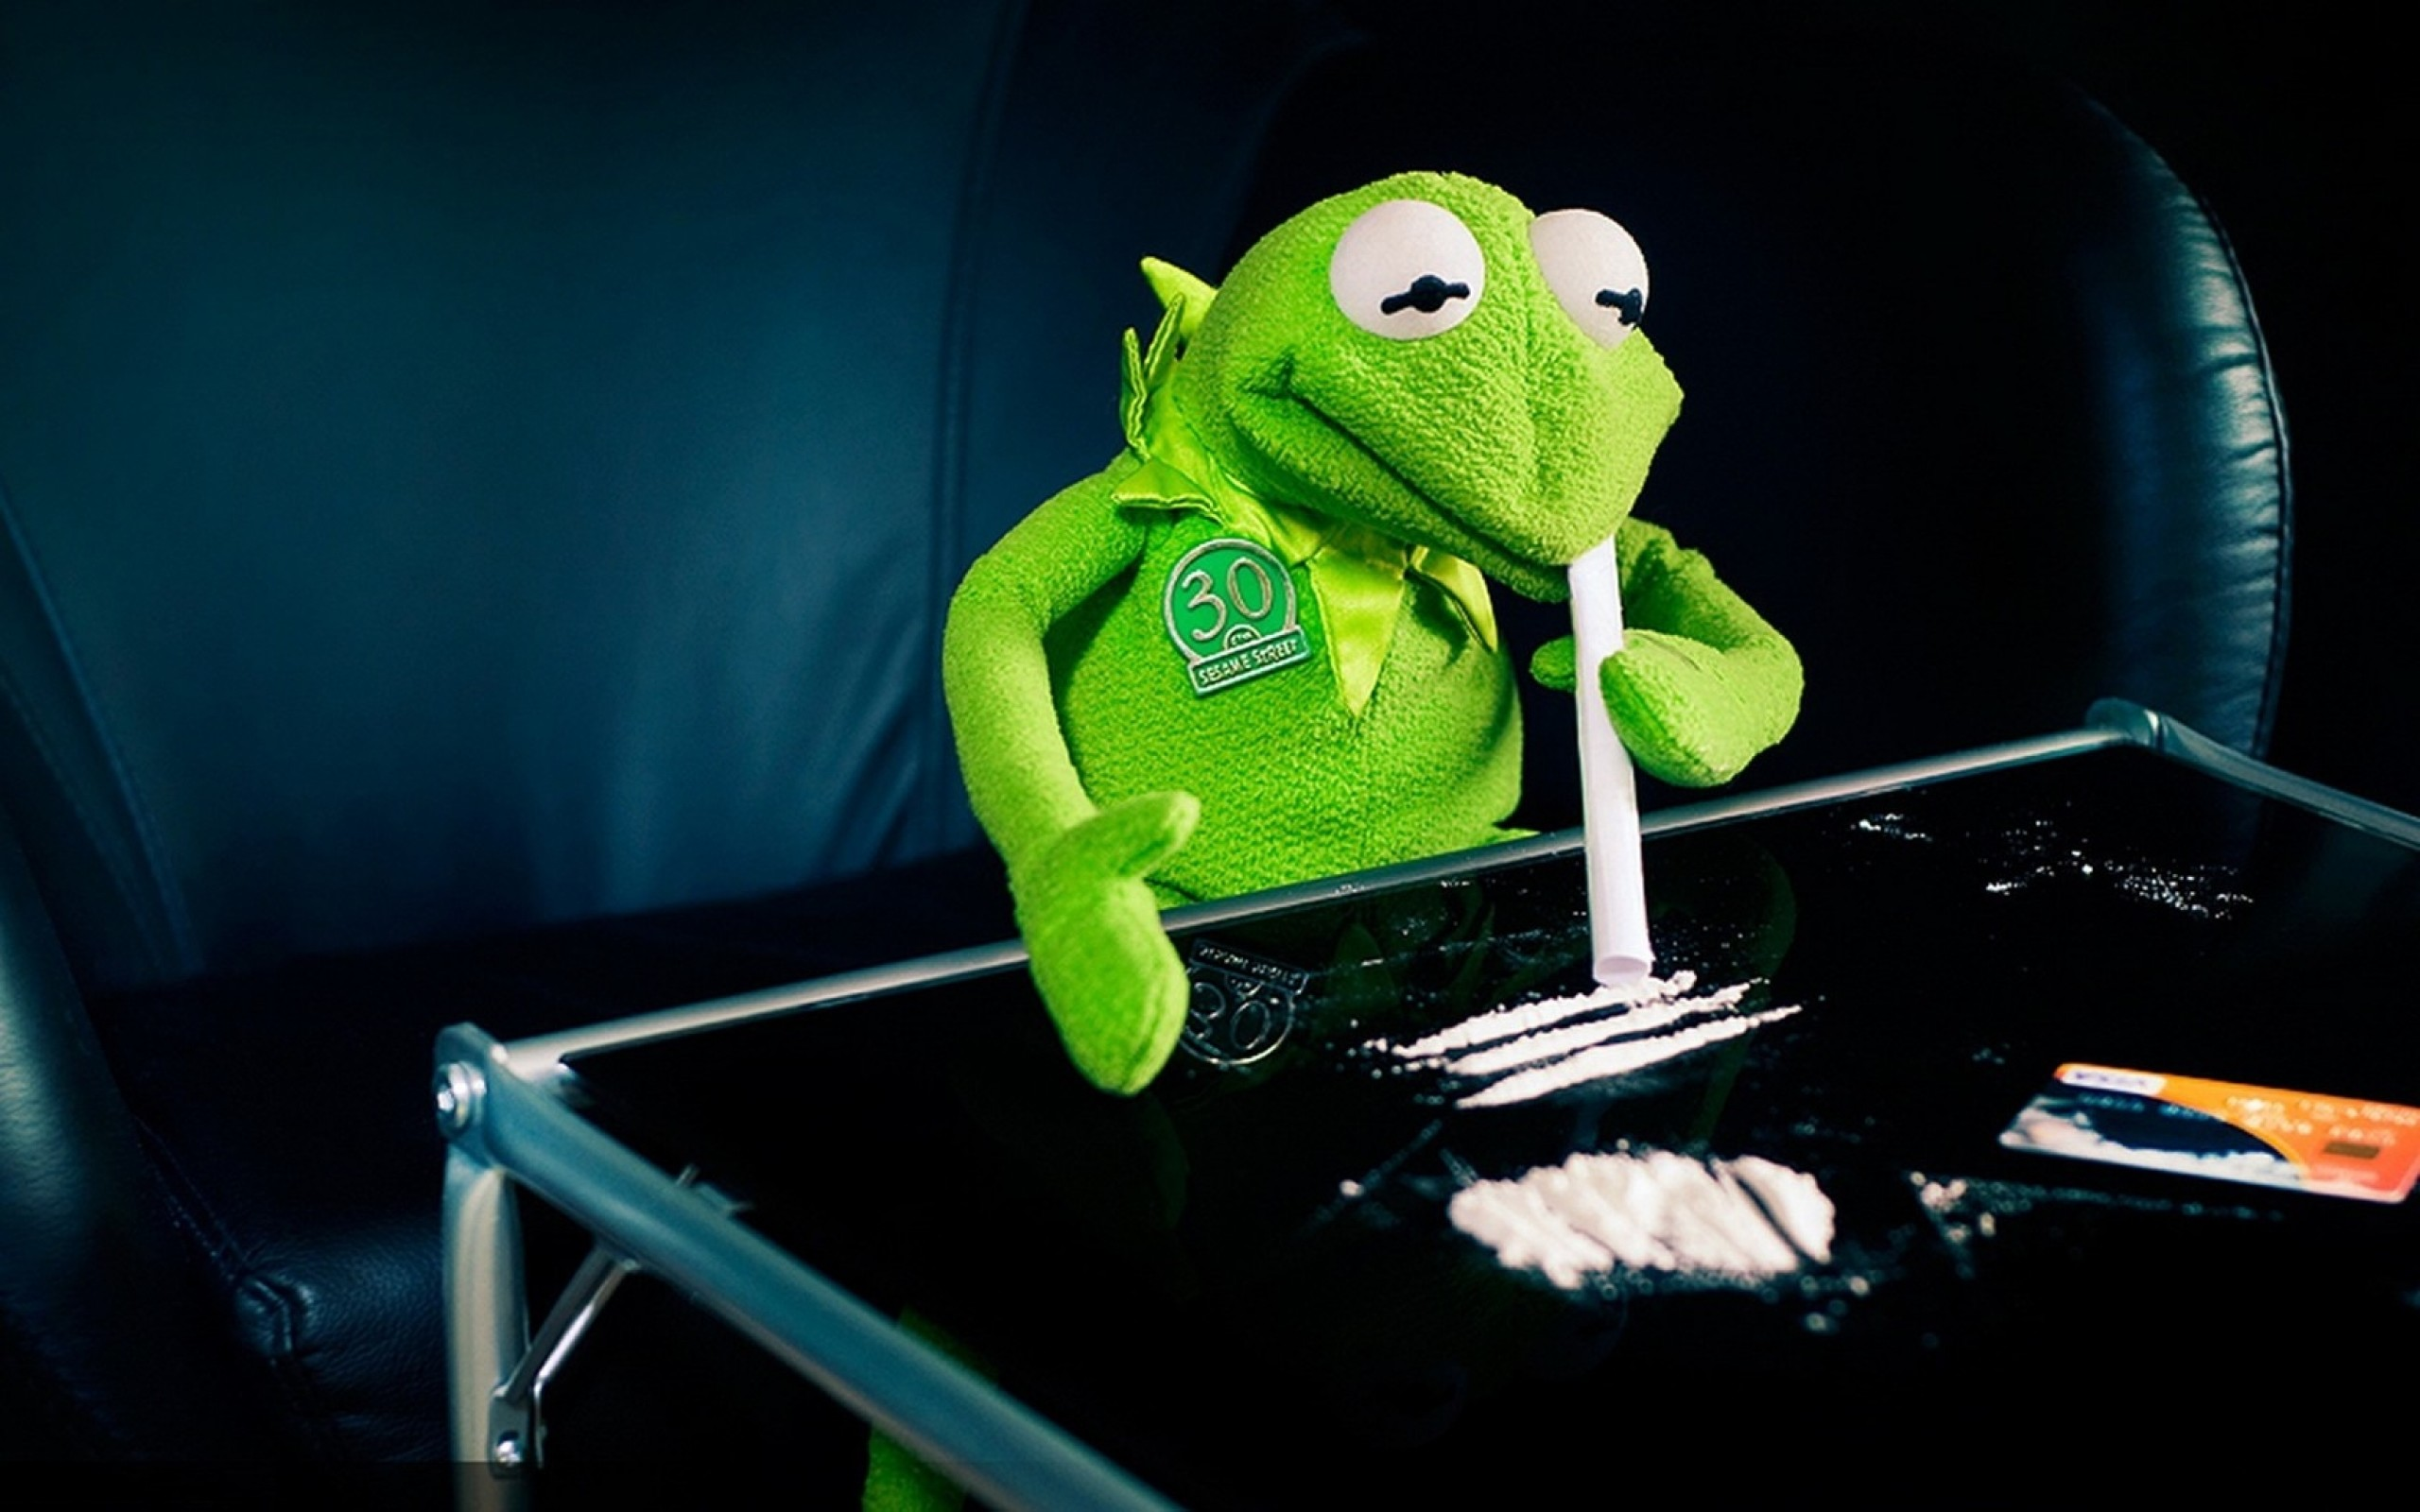 Kermit the frog cocaine 1680 wallpaper